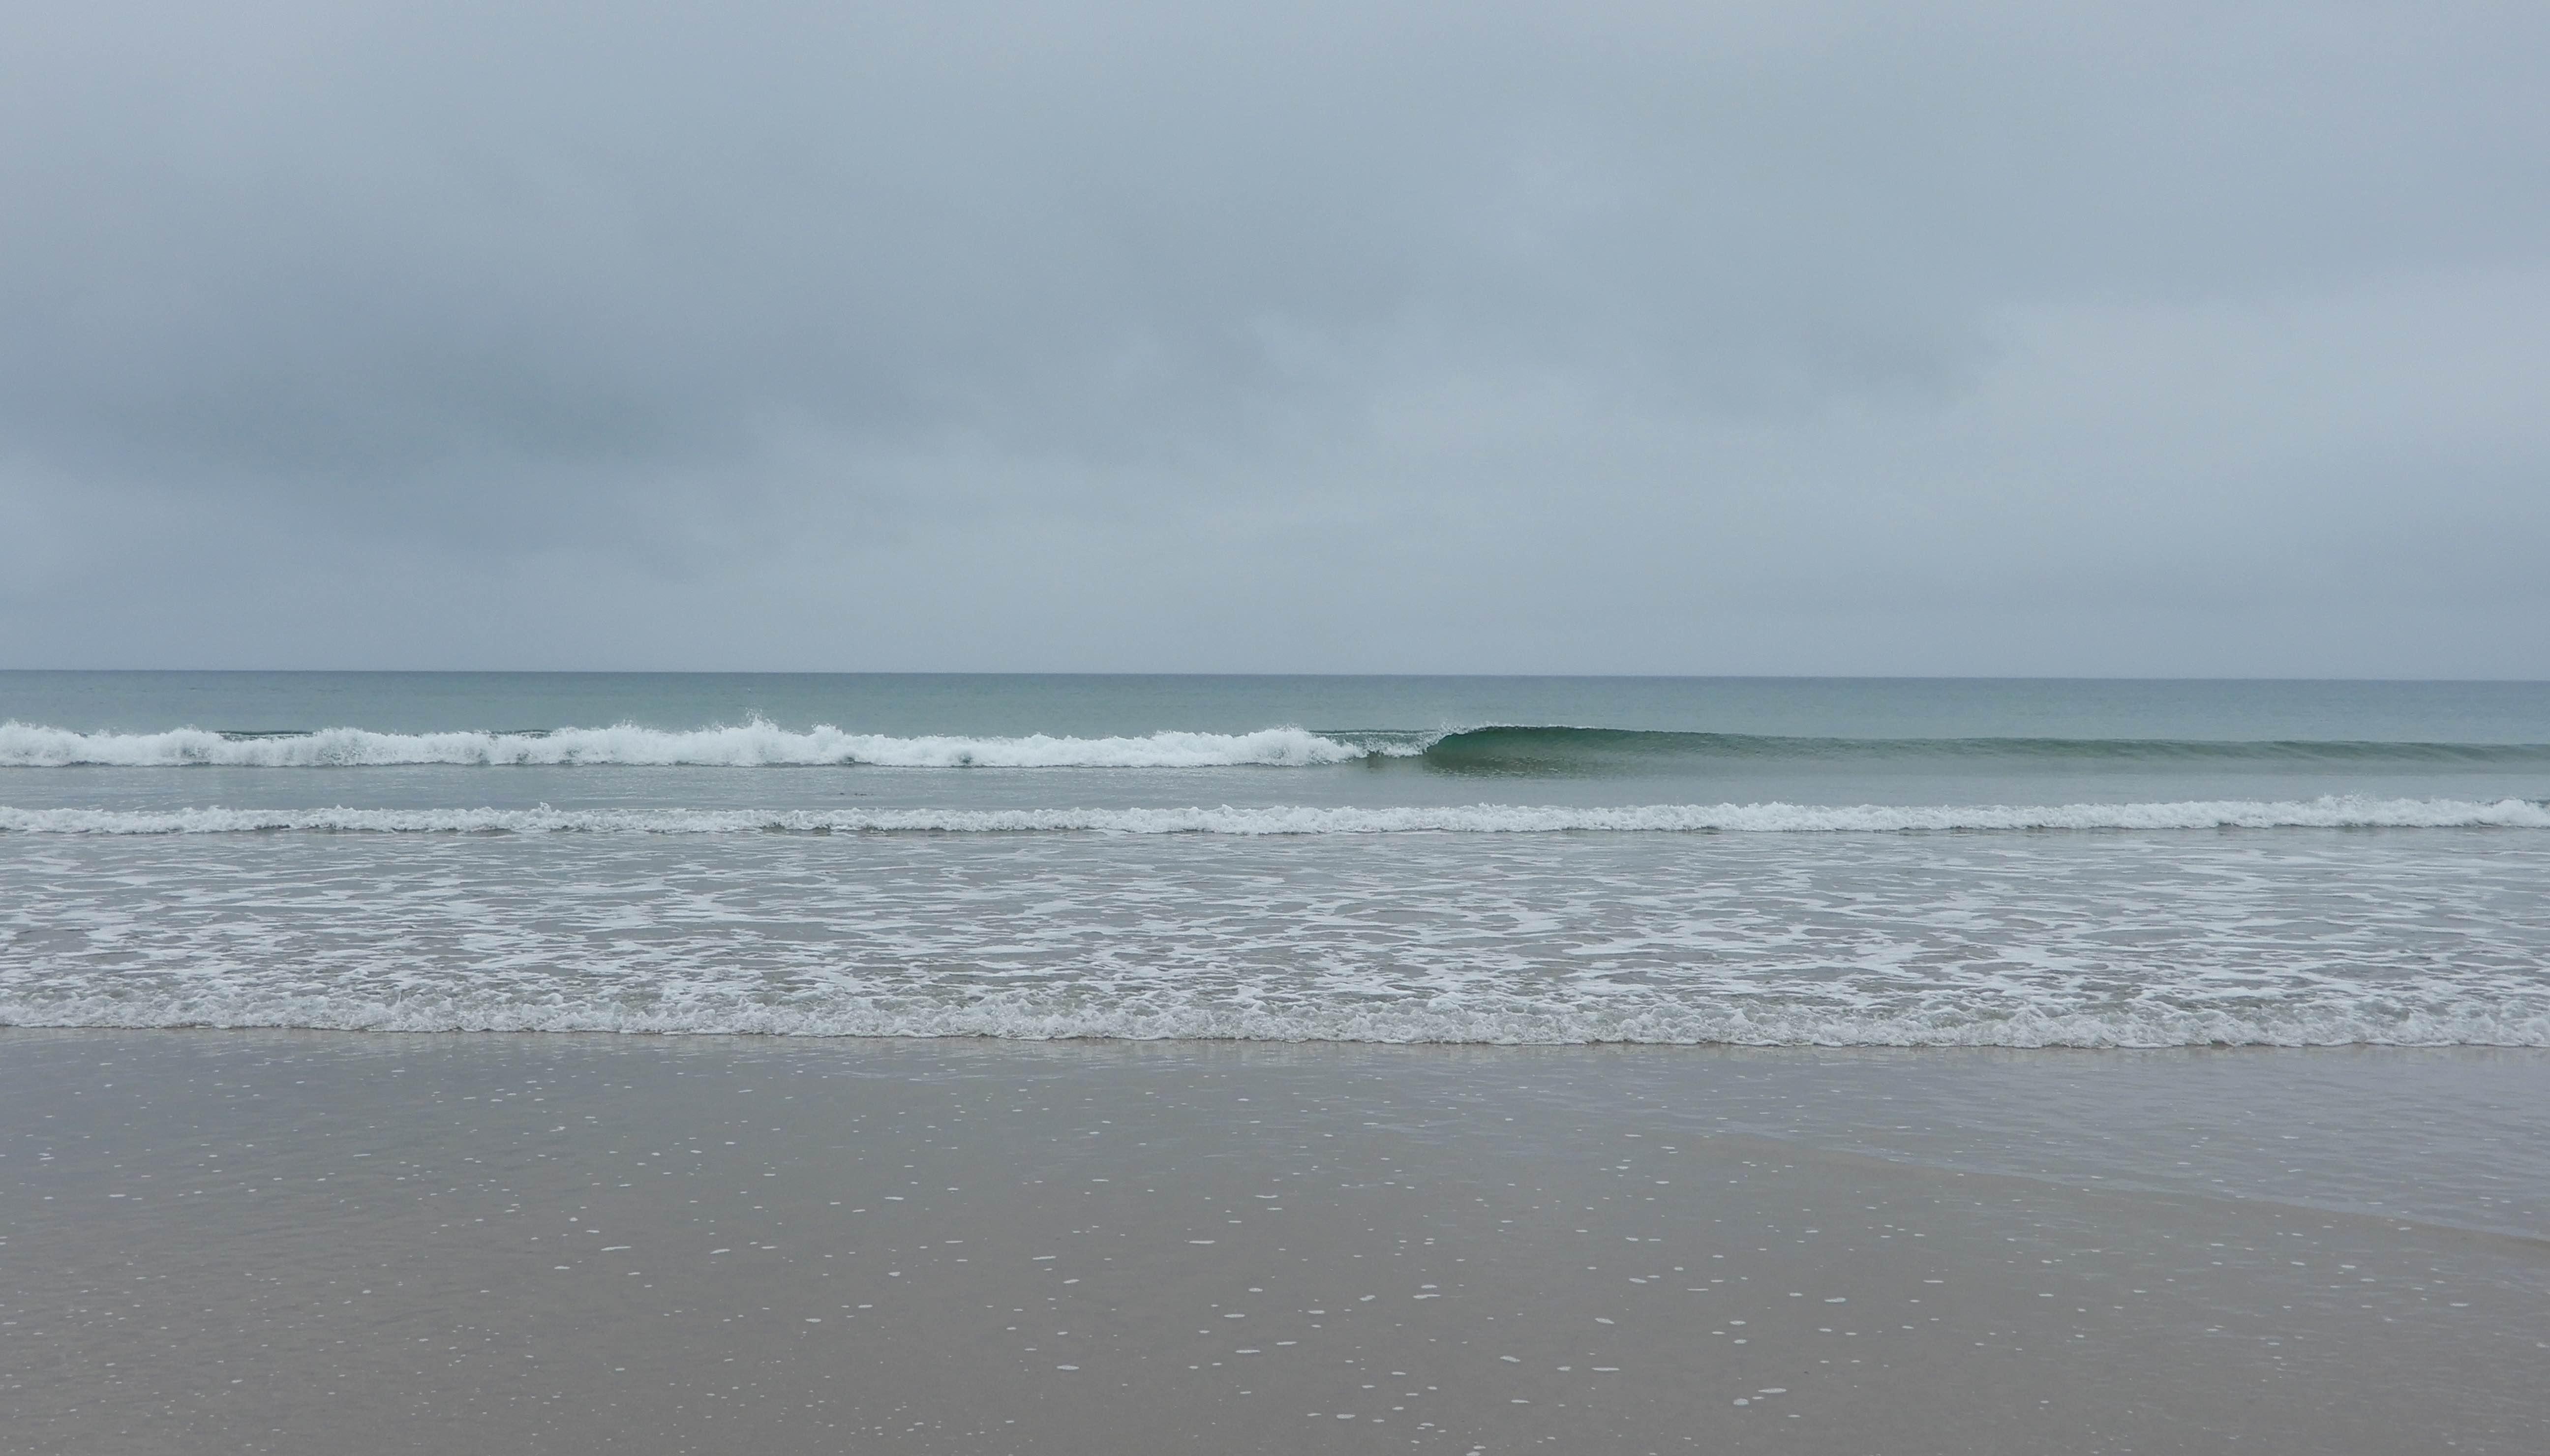 5.Godfreys Beach